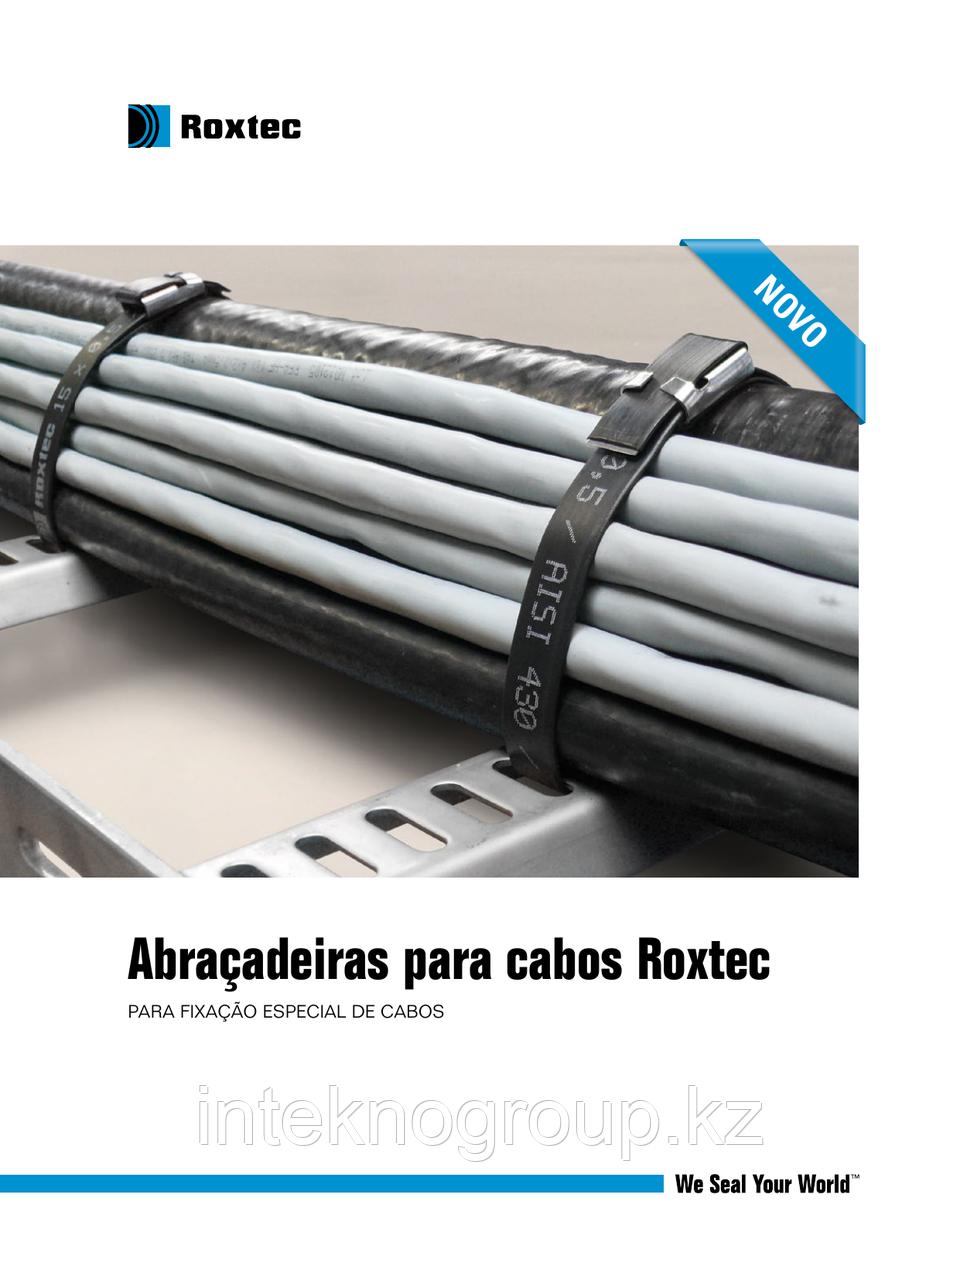 Roxtec Cable straps Strap 15x0,5 grey/galv. L=600 mm